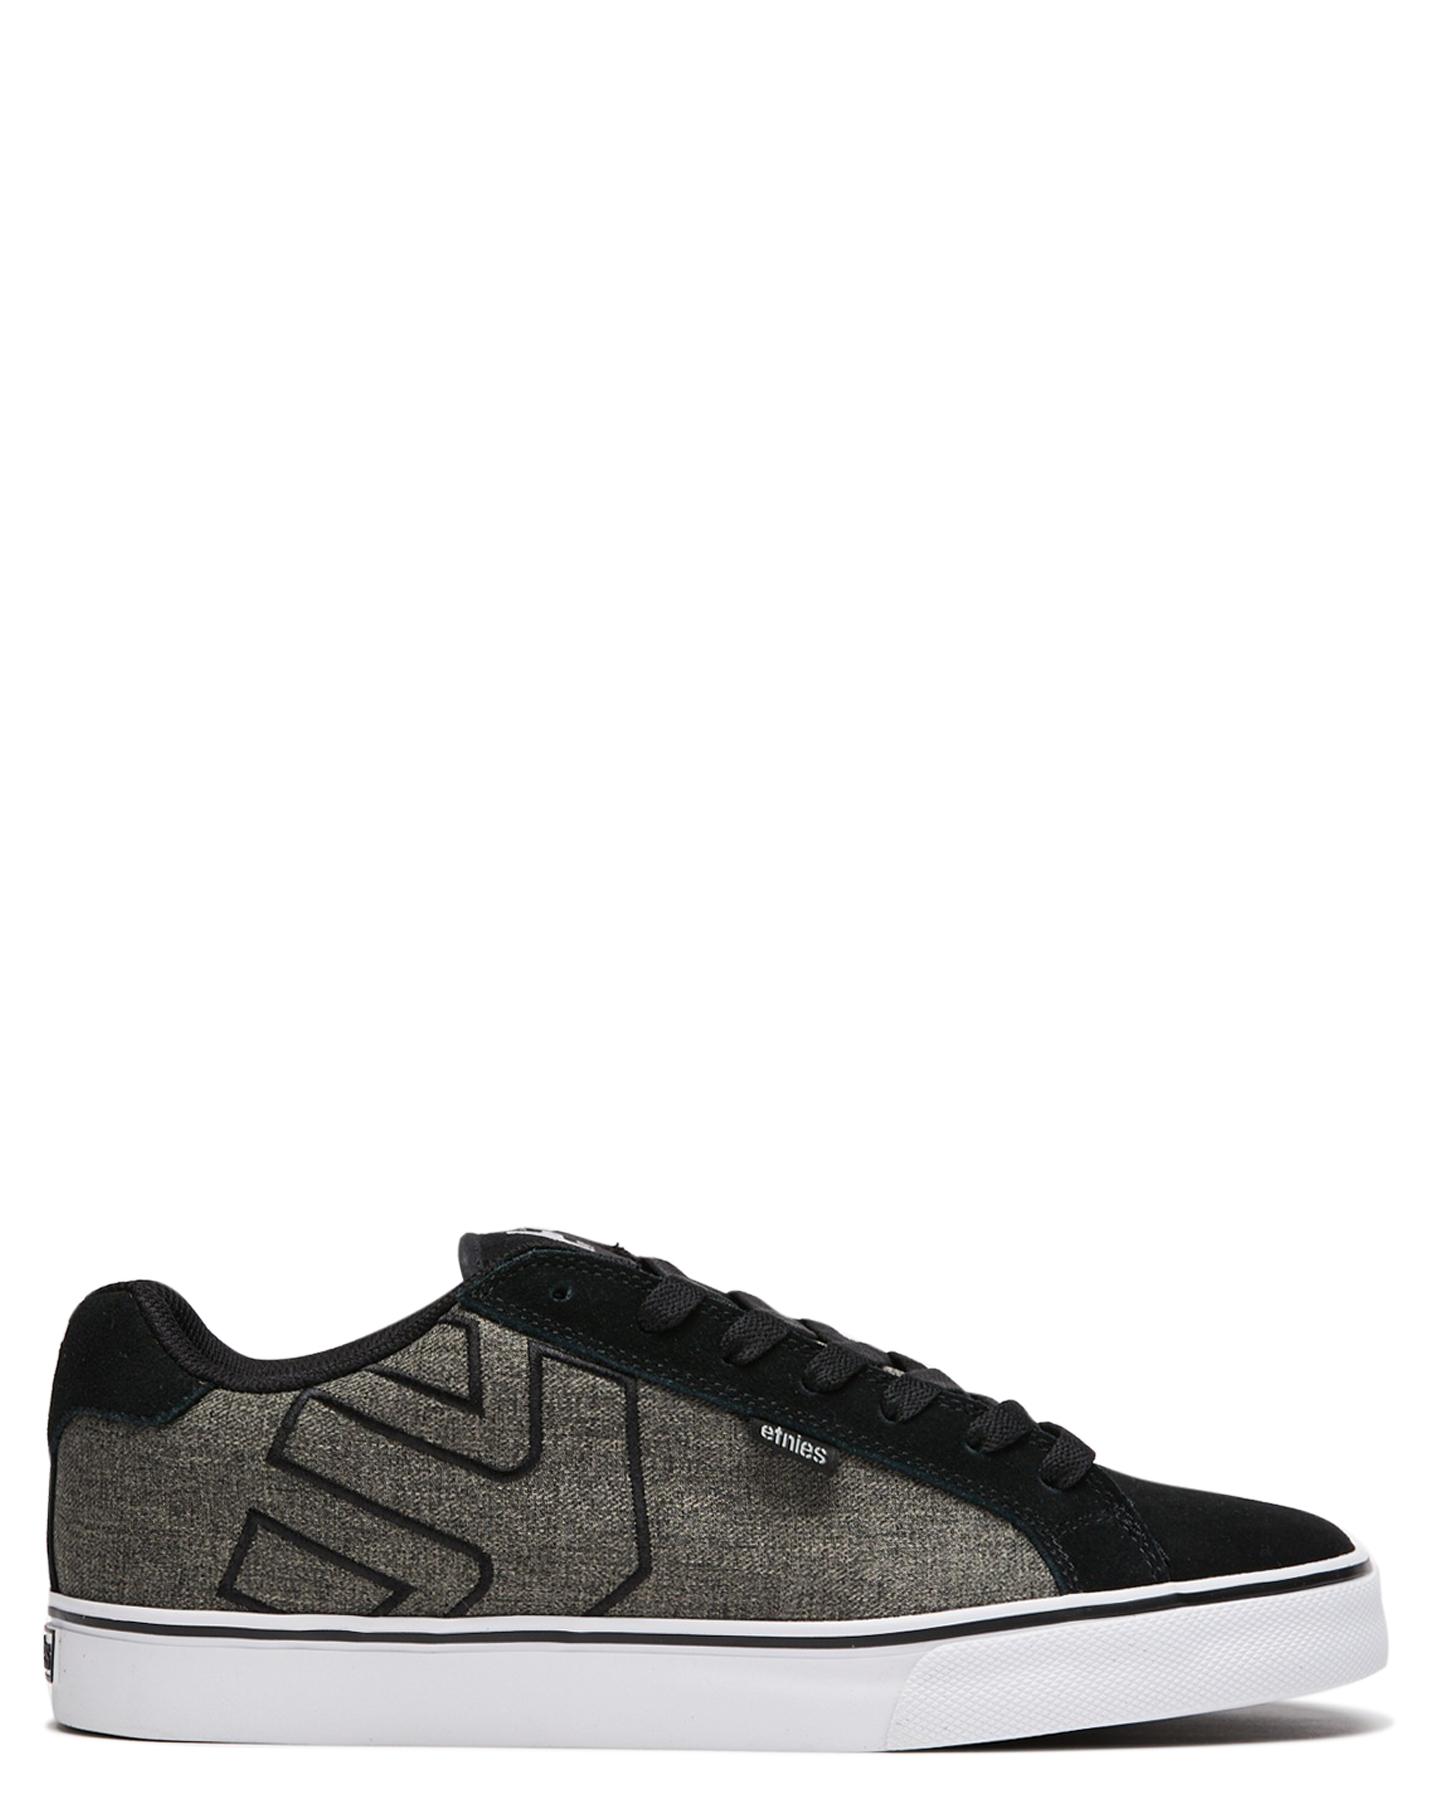 Etnies Mens Fader Vulc Shoe Black Grey Grey